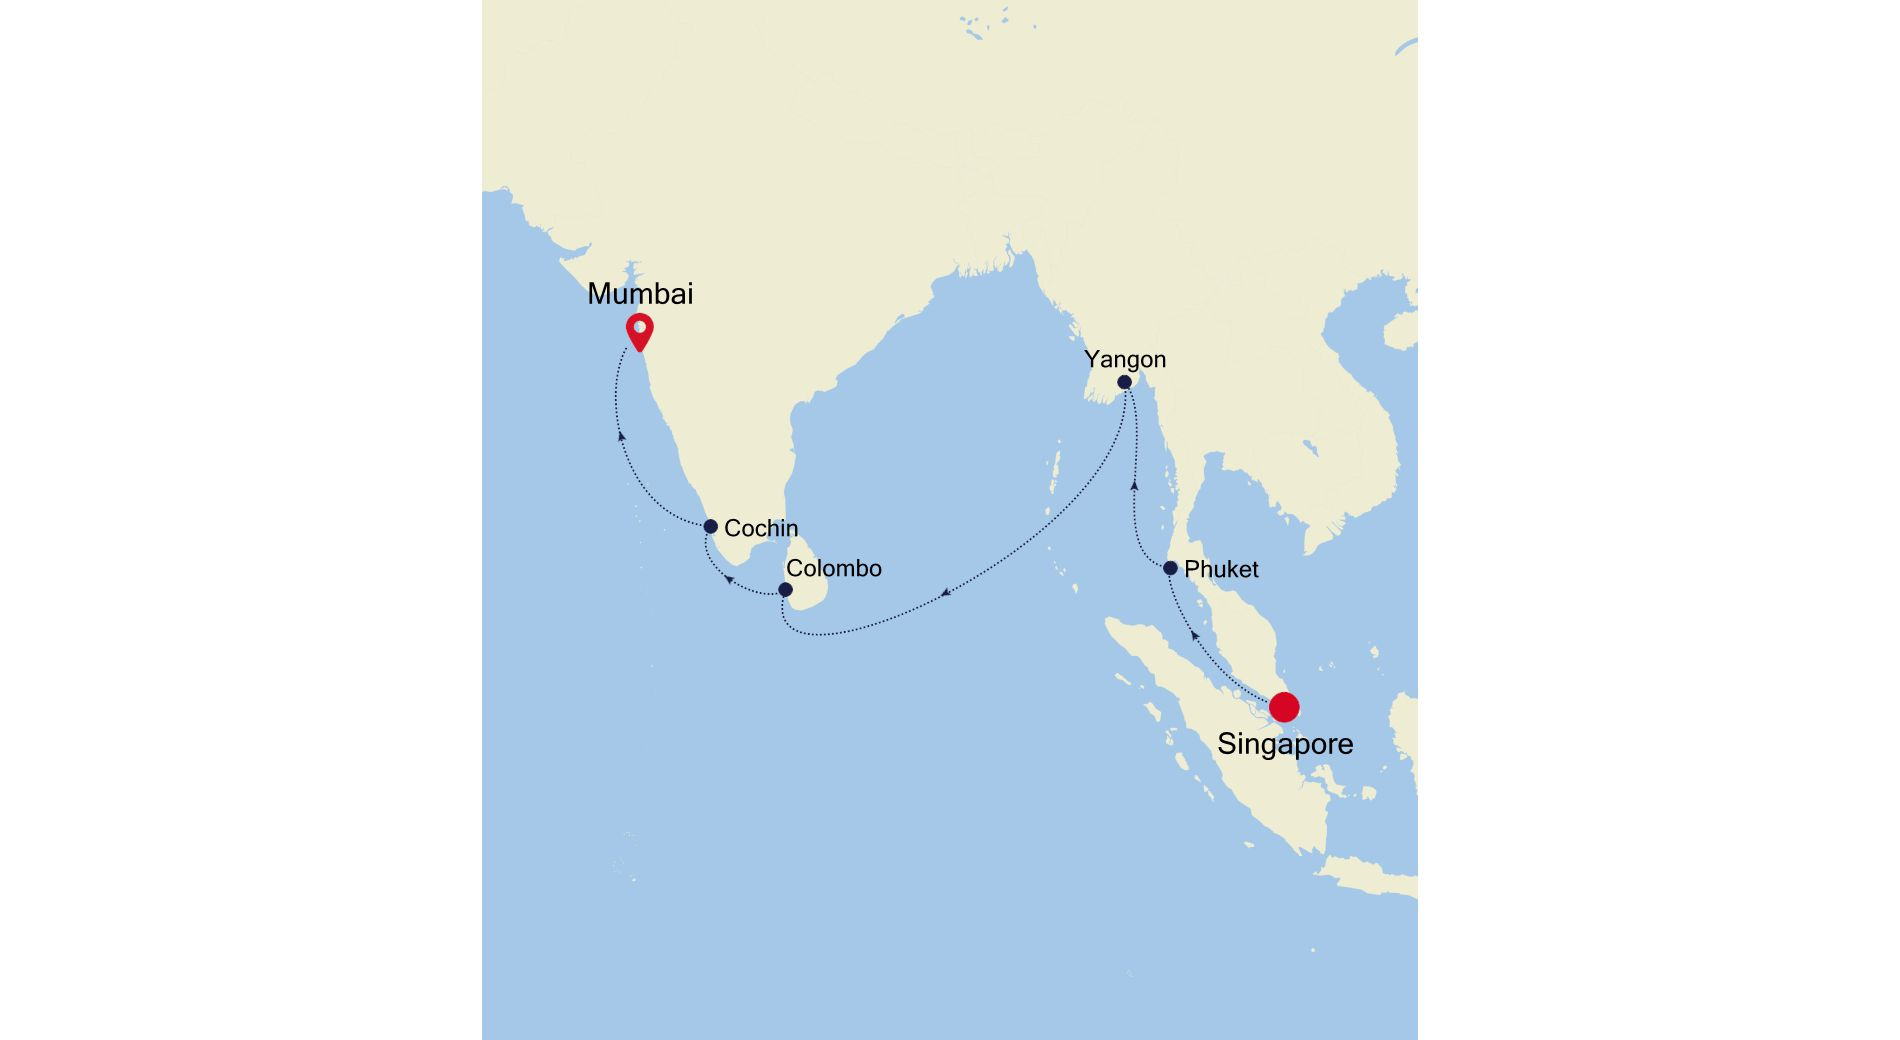 5005 - Singapore a Mumbai